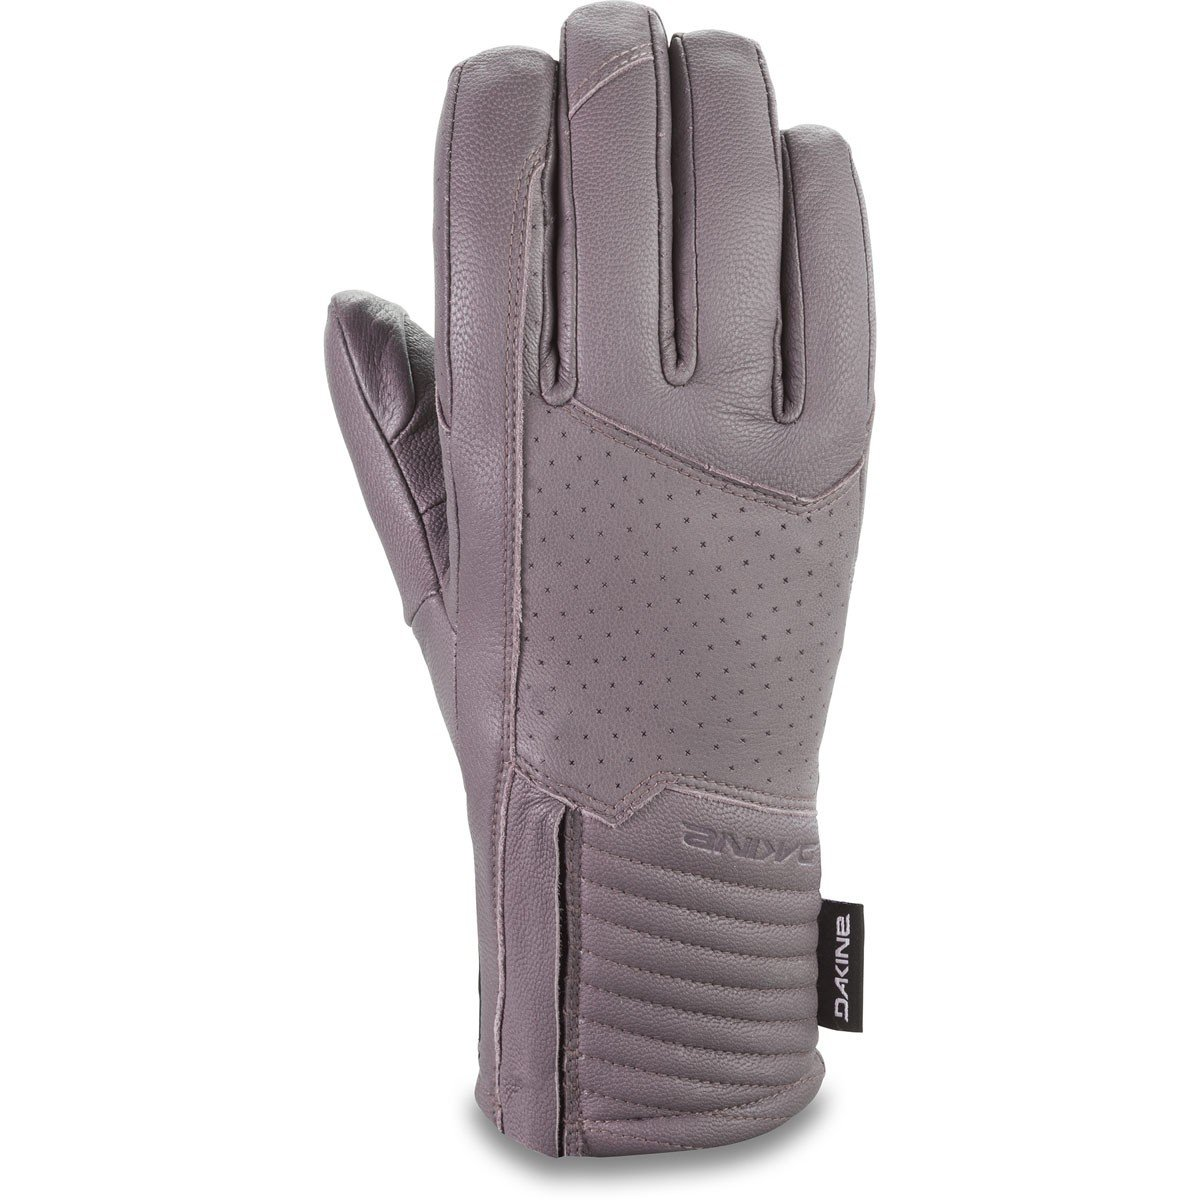 Dakine Women's Rogue GORE-TEX Glove